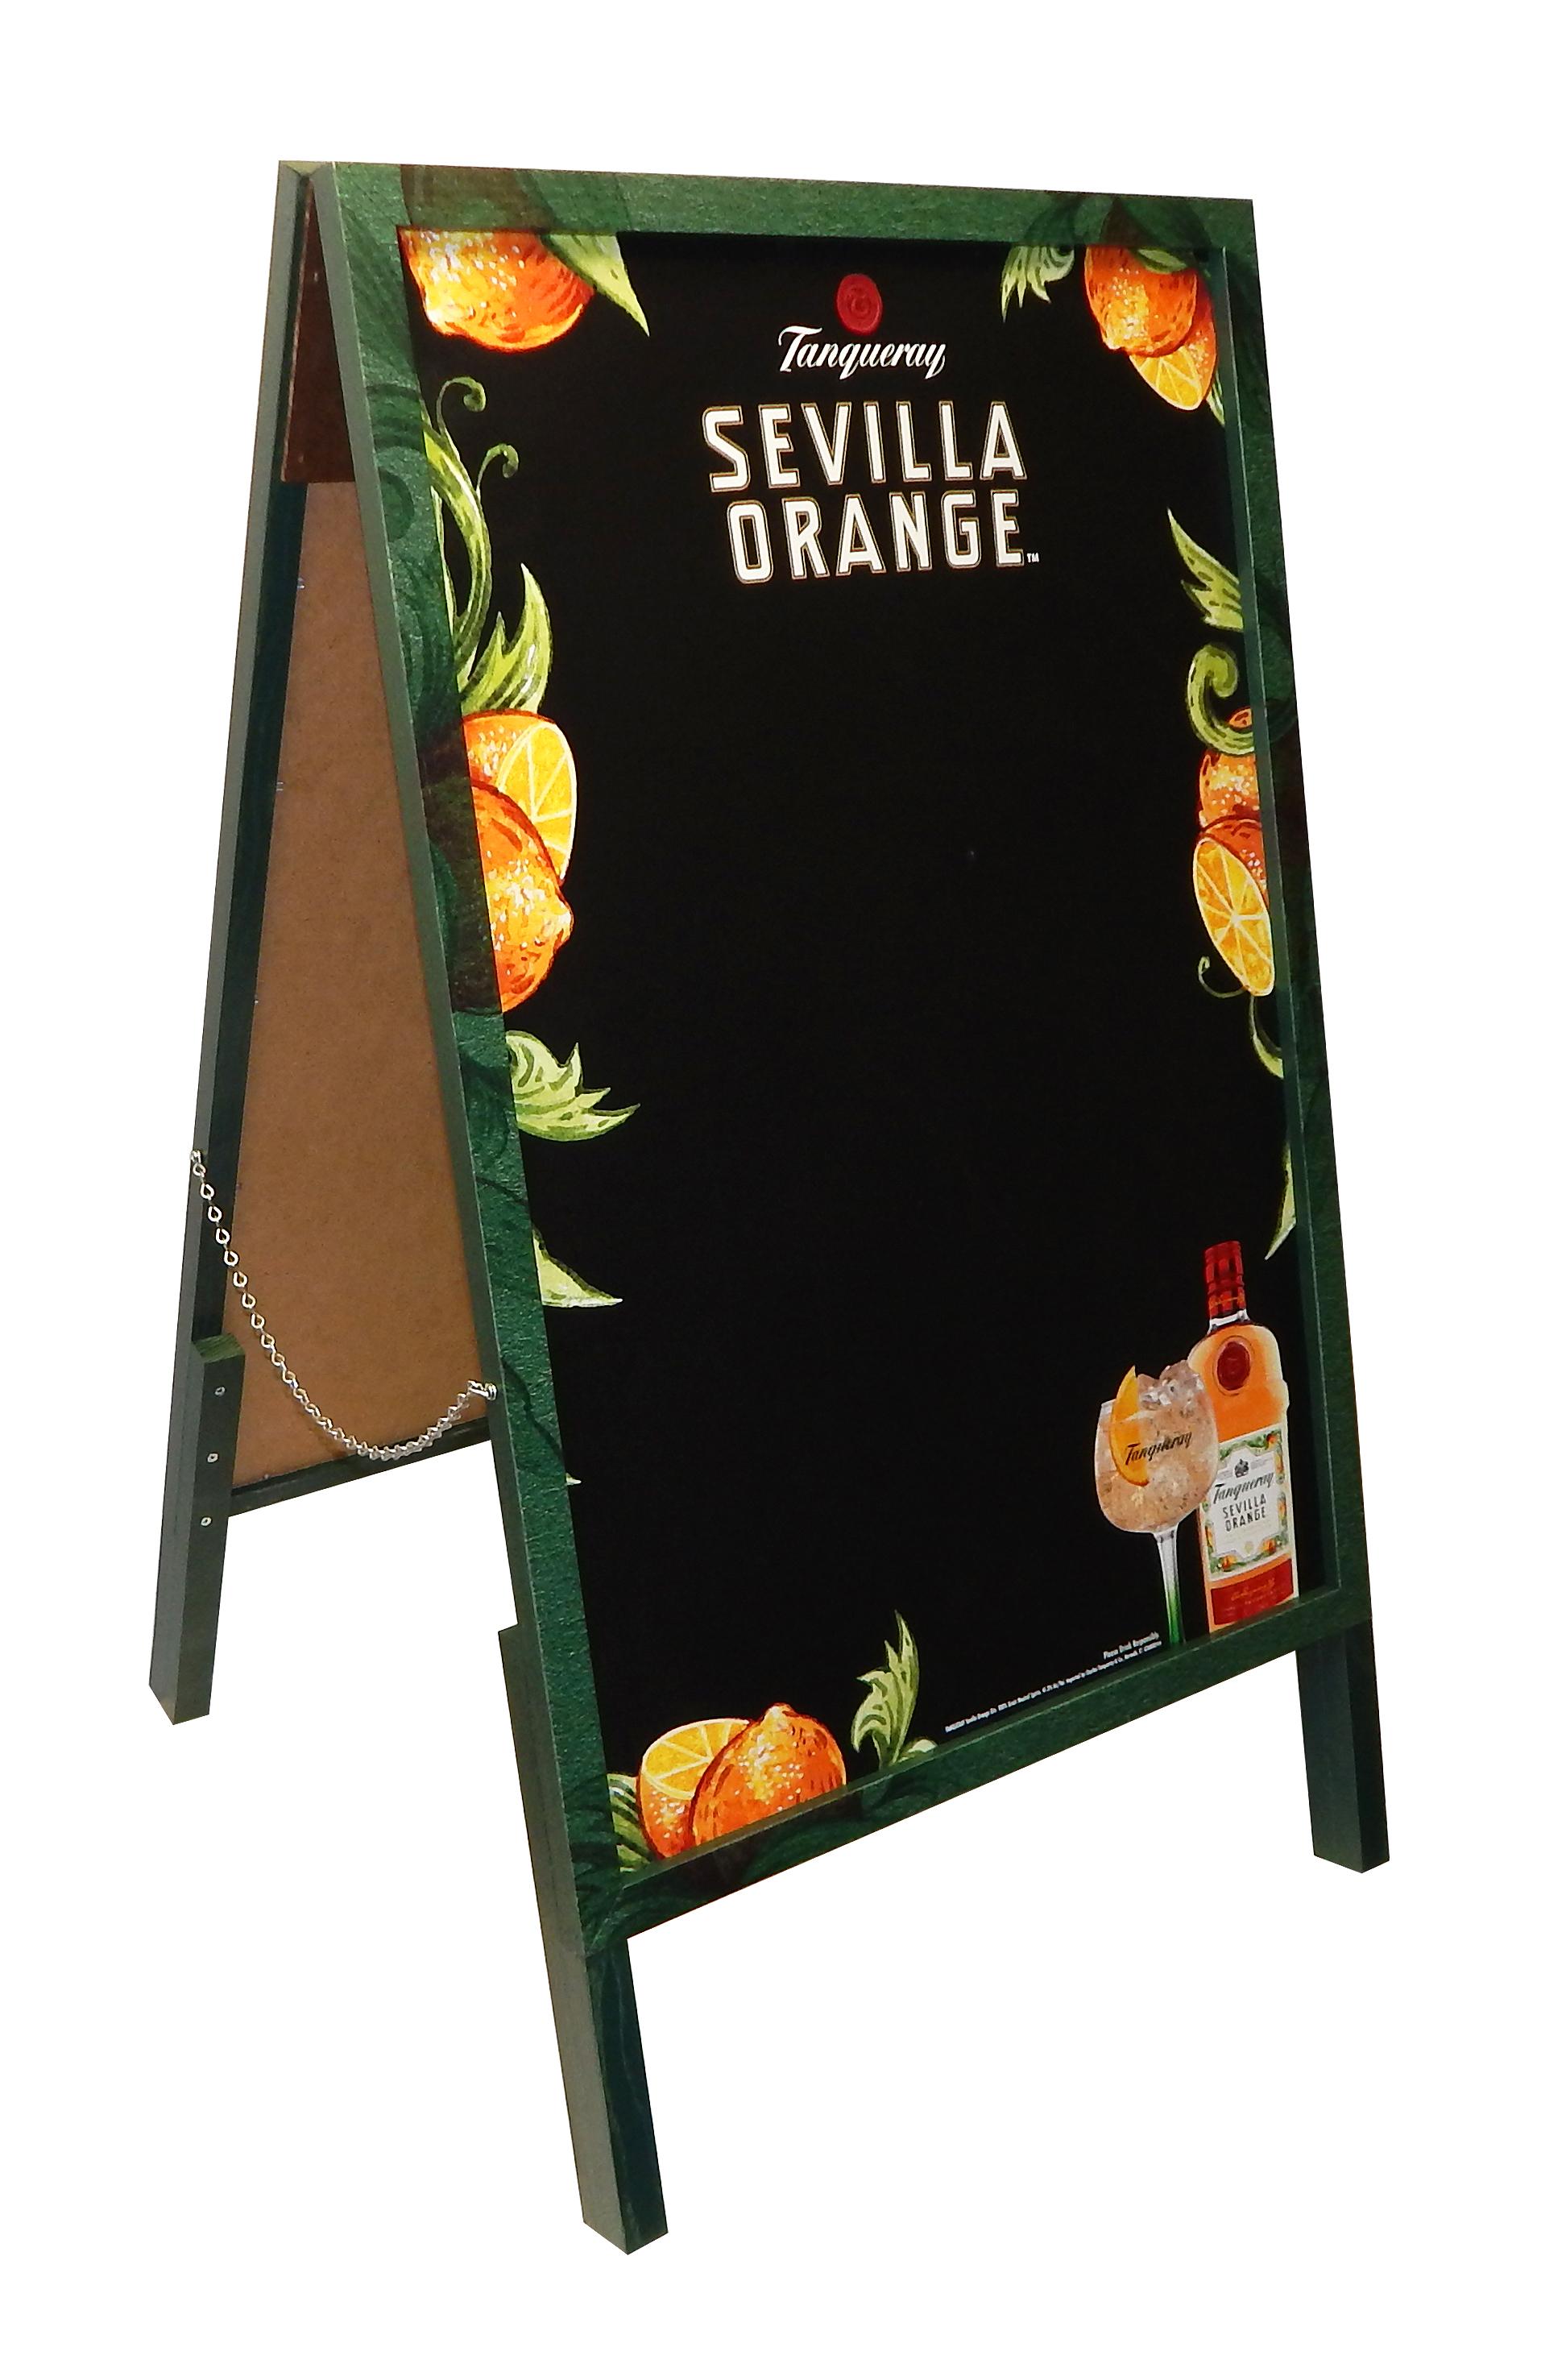 ADM-106 Tanqueray Sevilla Orange A-Frame